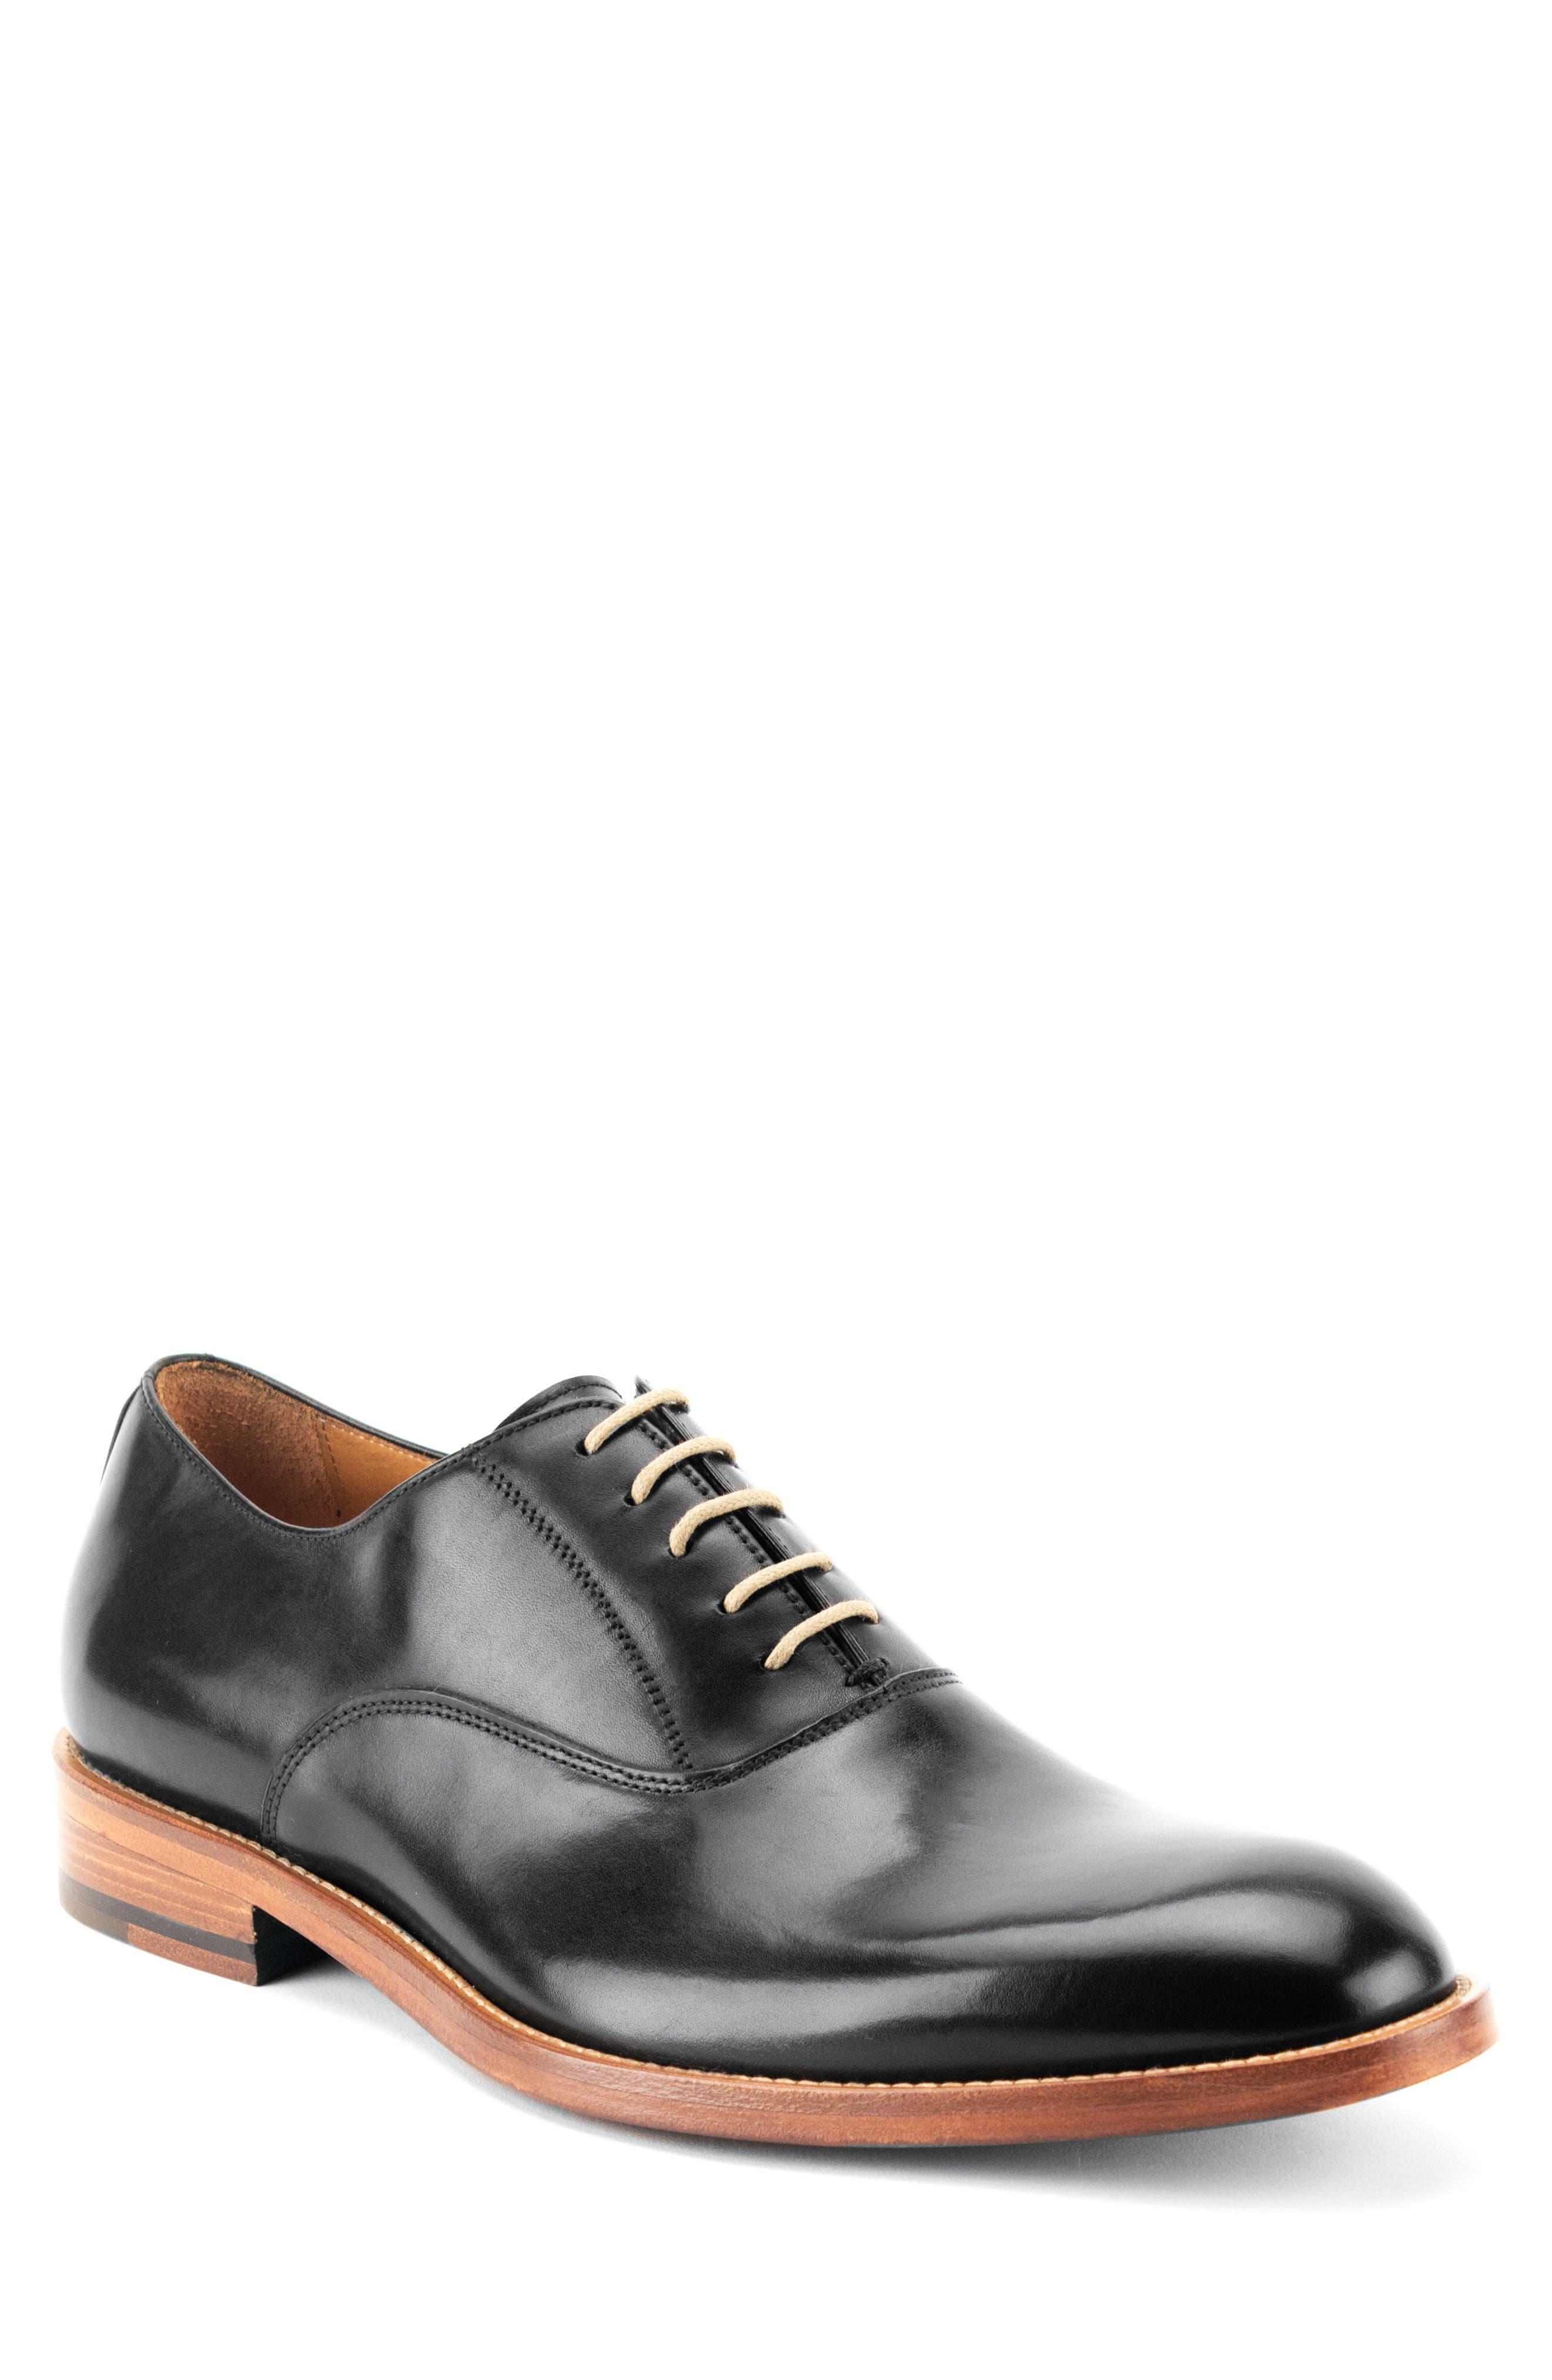 Oliver Plain Toe Oxford,                         Main,                         color, BLACK LEATHER